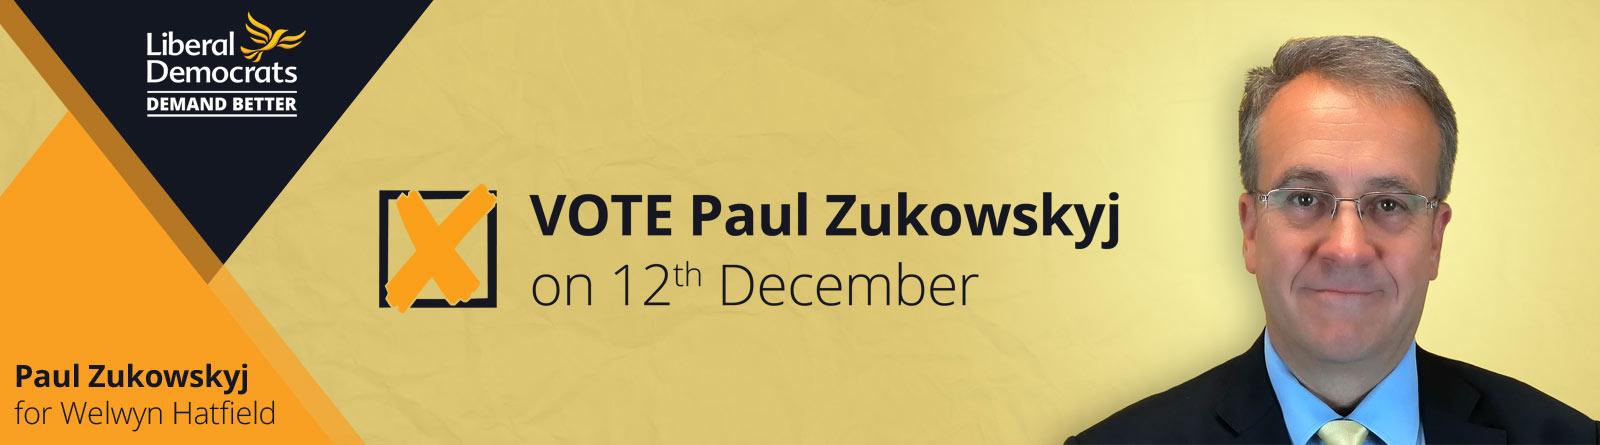 Vote Paul Zukowskyj